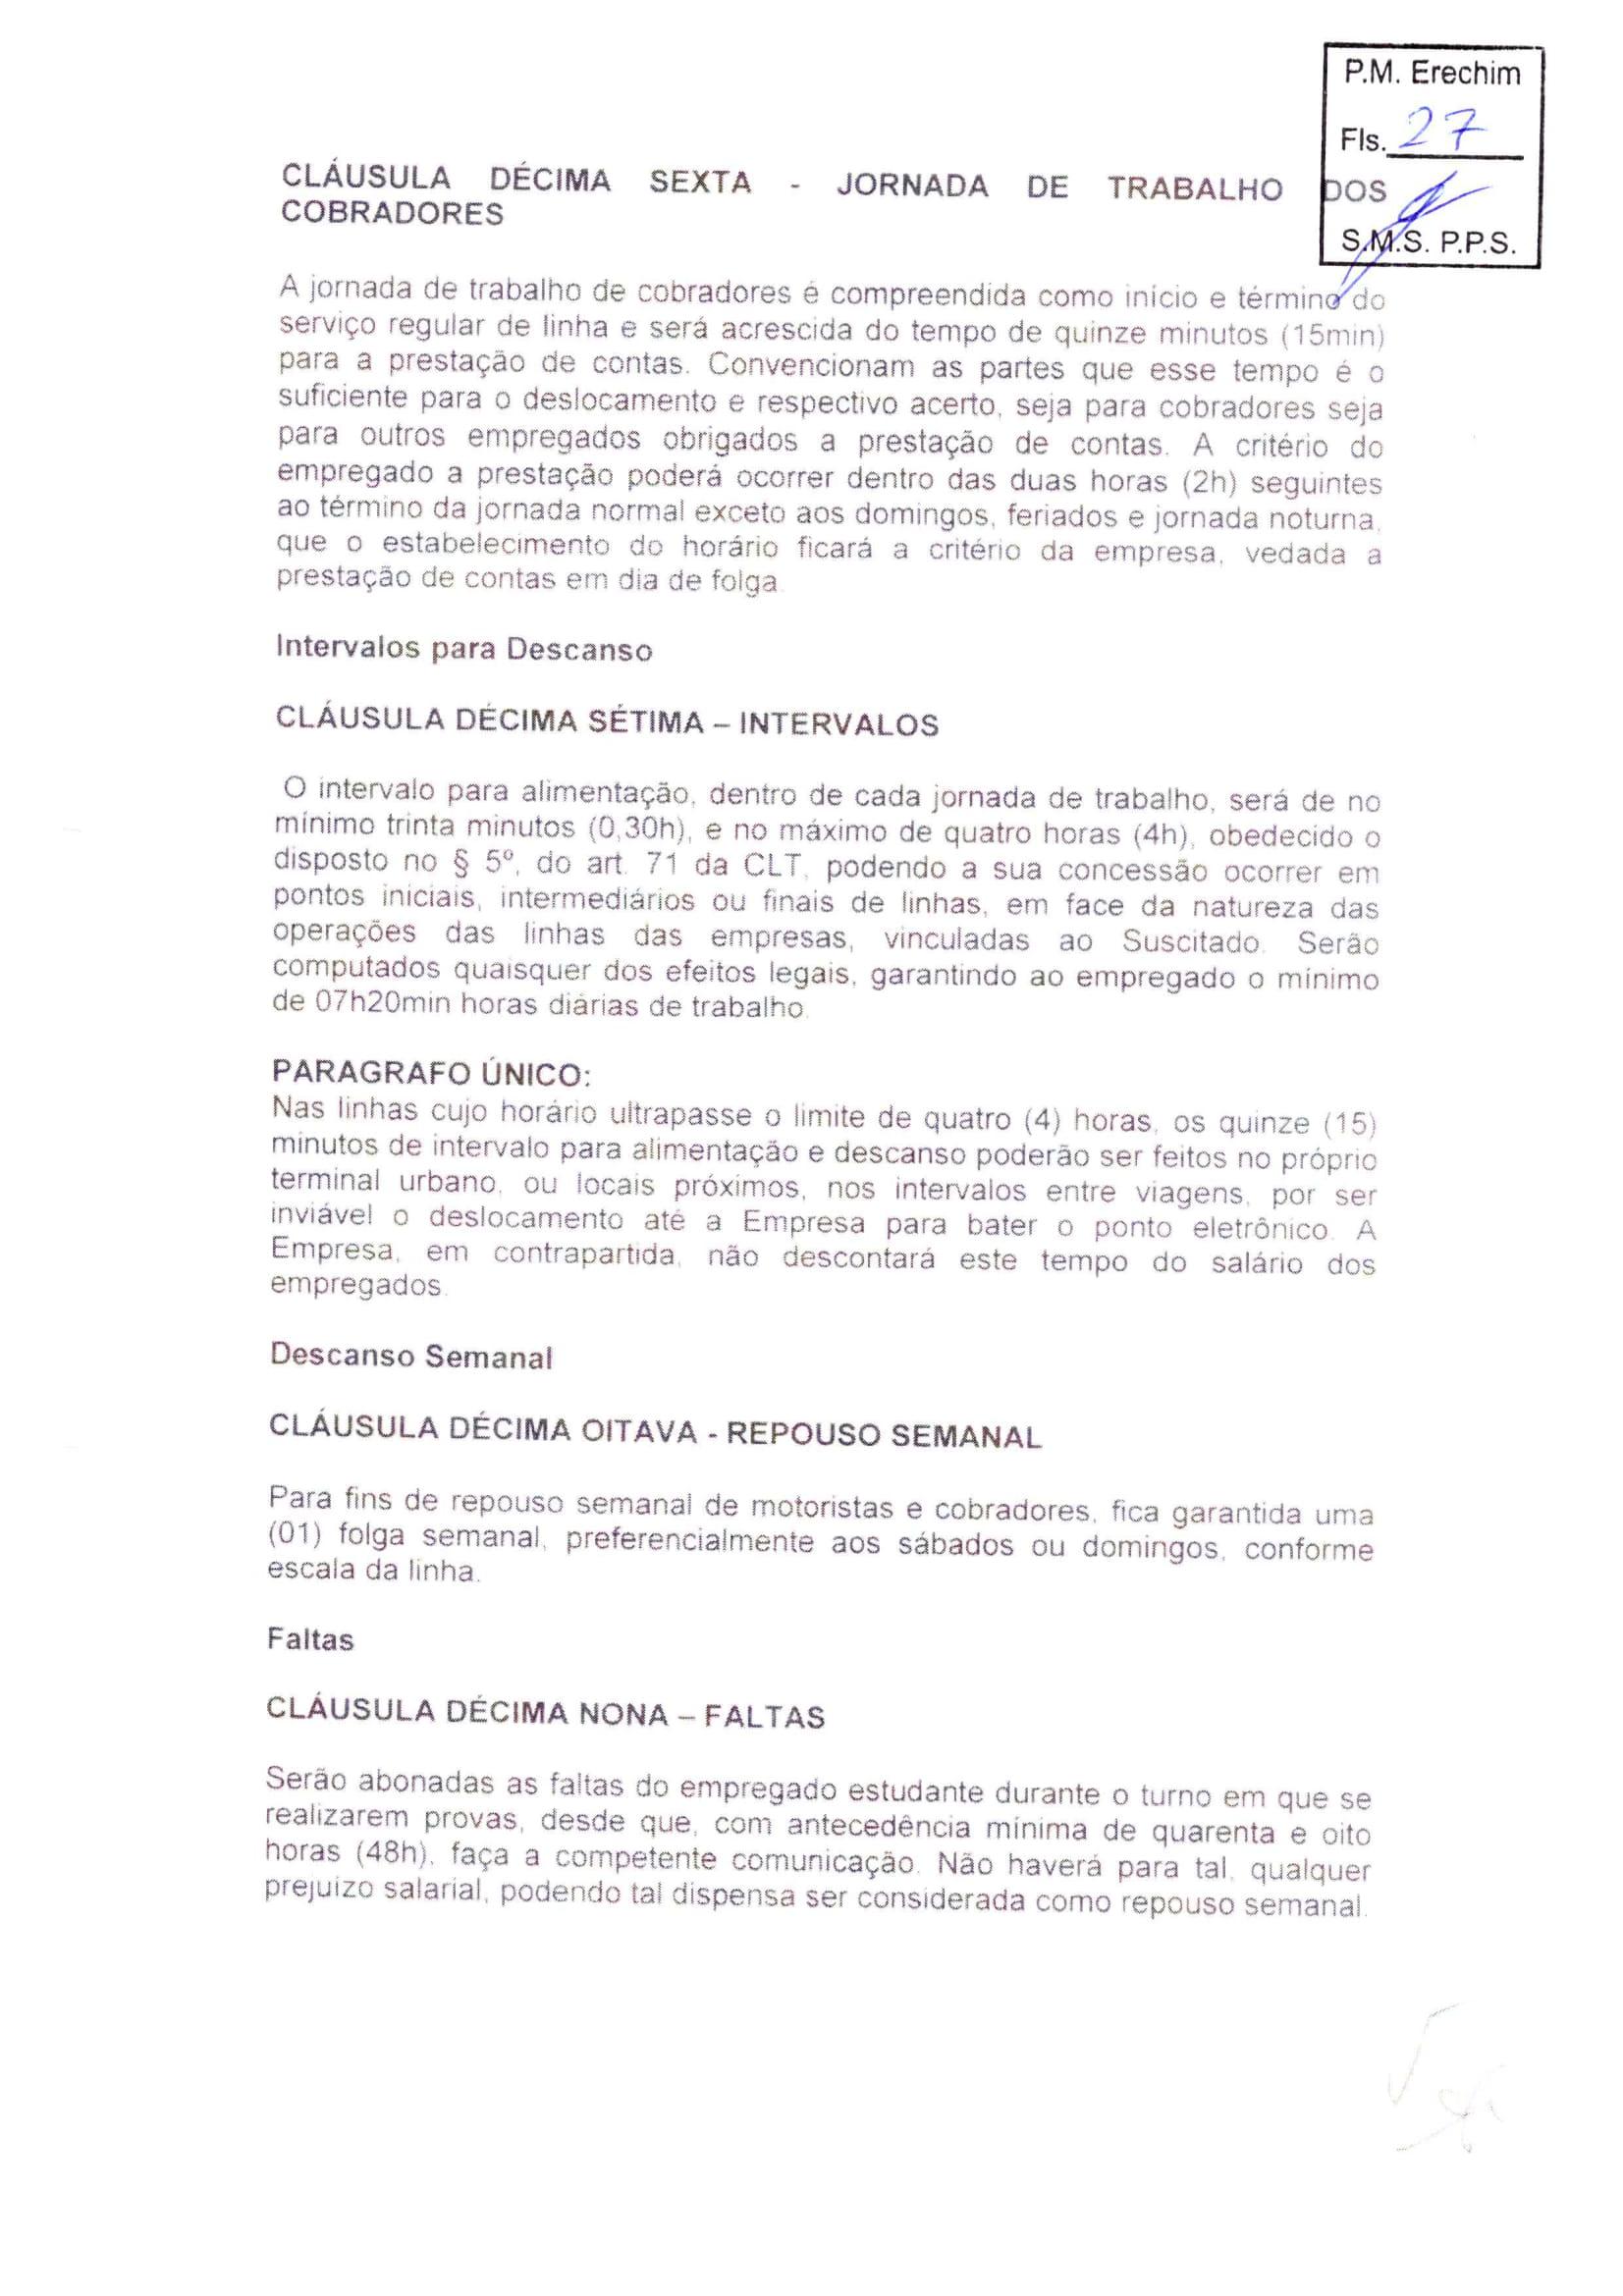 Tarifas - Atualizacao-09